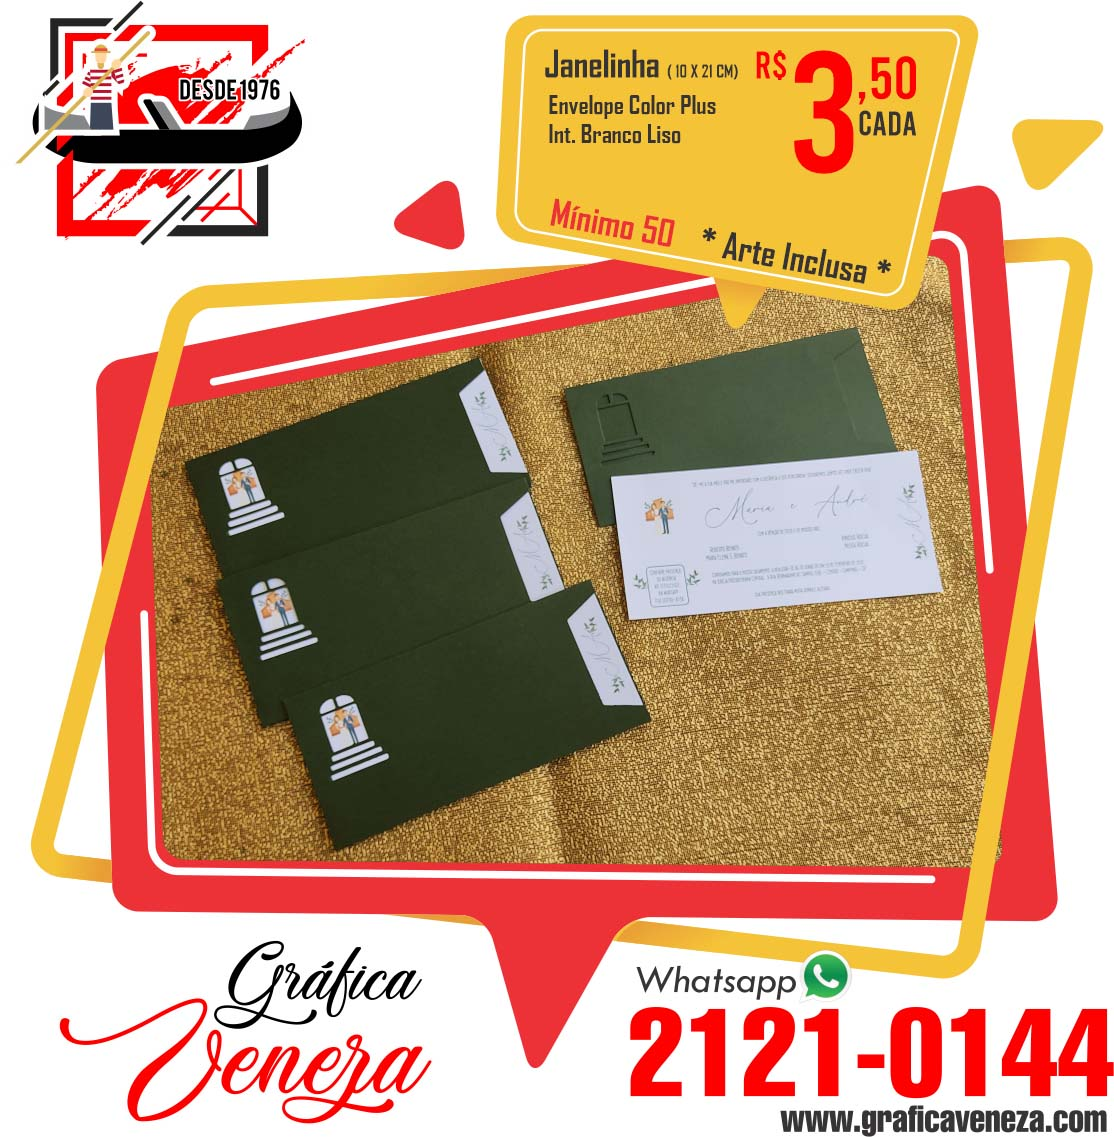 Janelinha - 10x21 cm